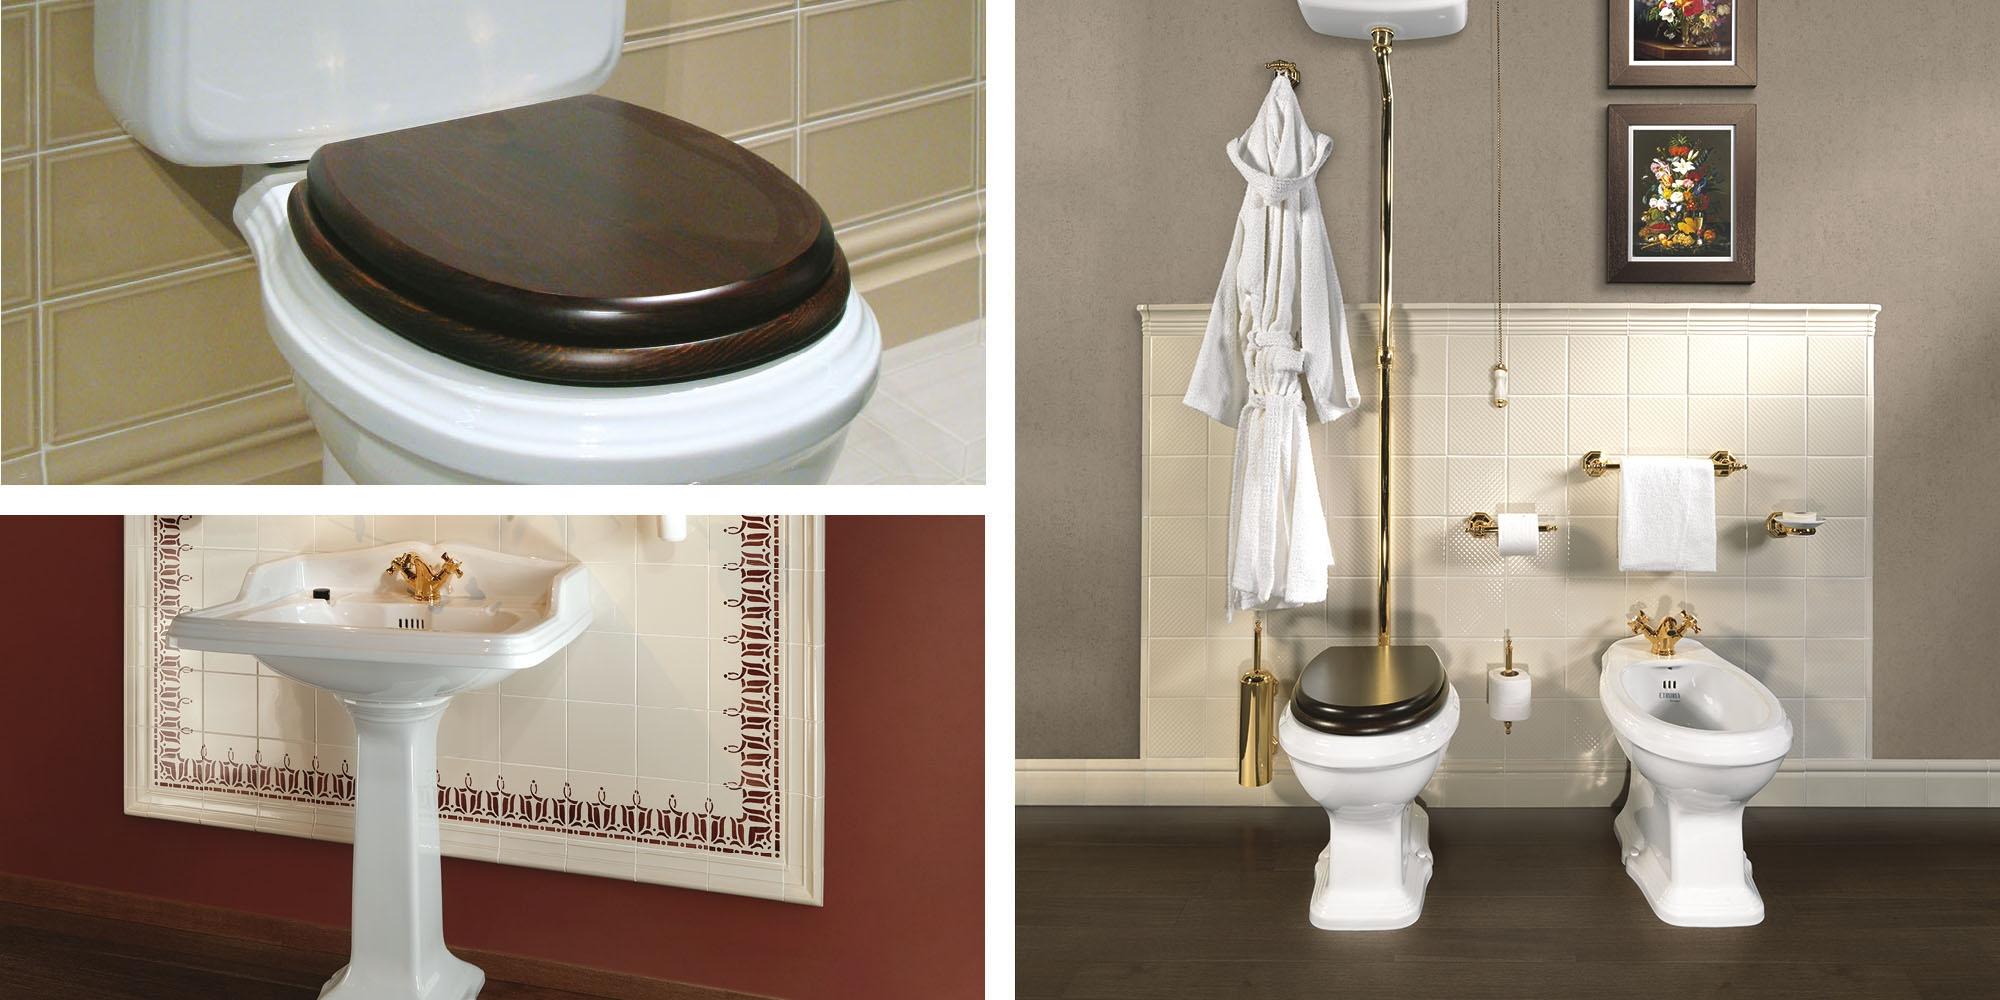 Sanitary Ware | Etruria Design